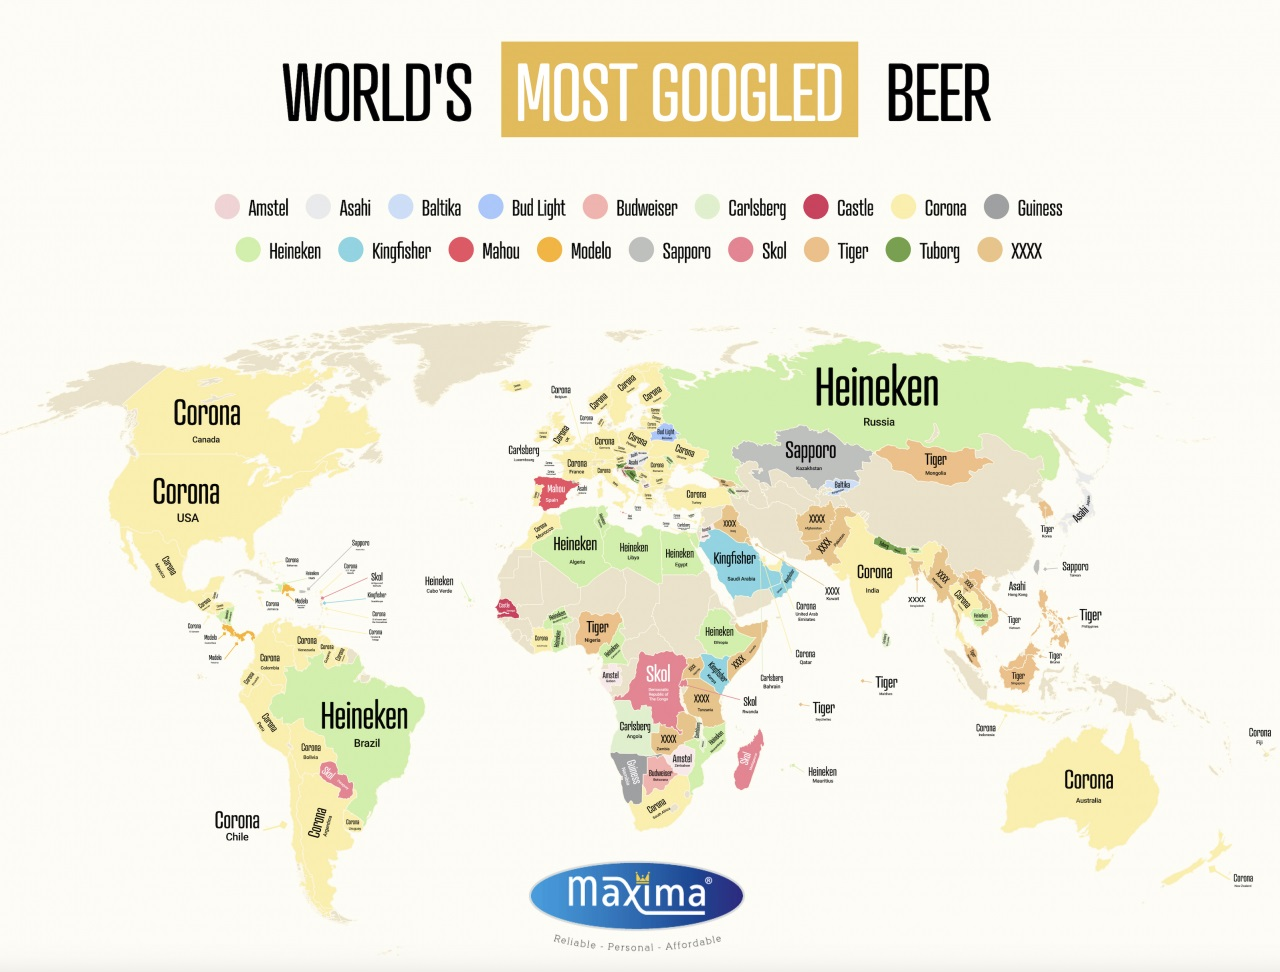 На основе запросов Google составлена карта популярности пива